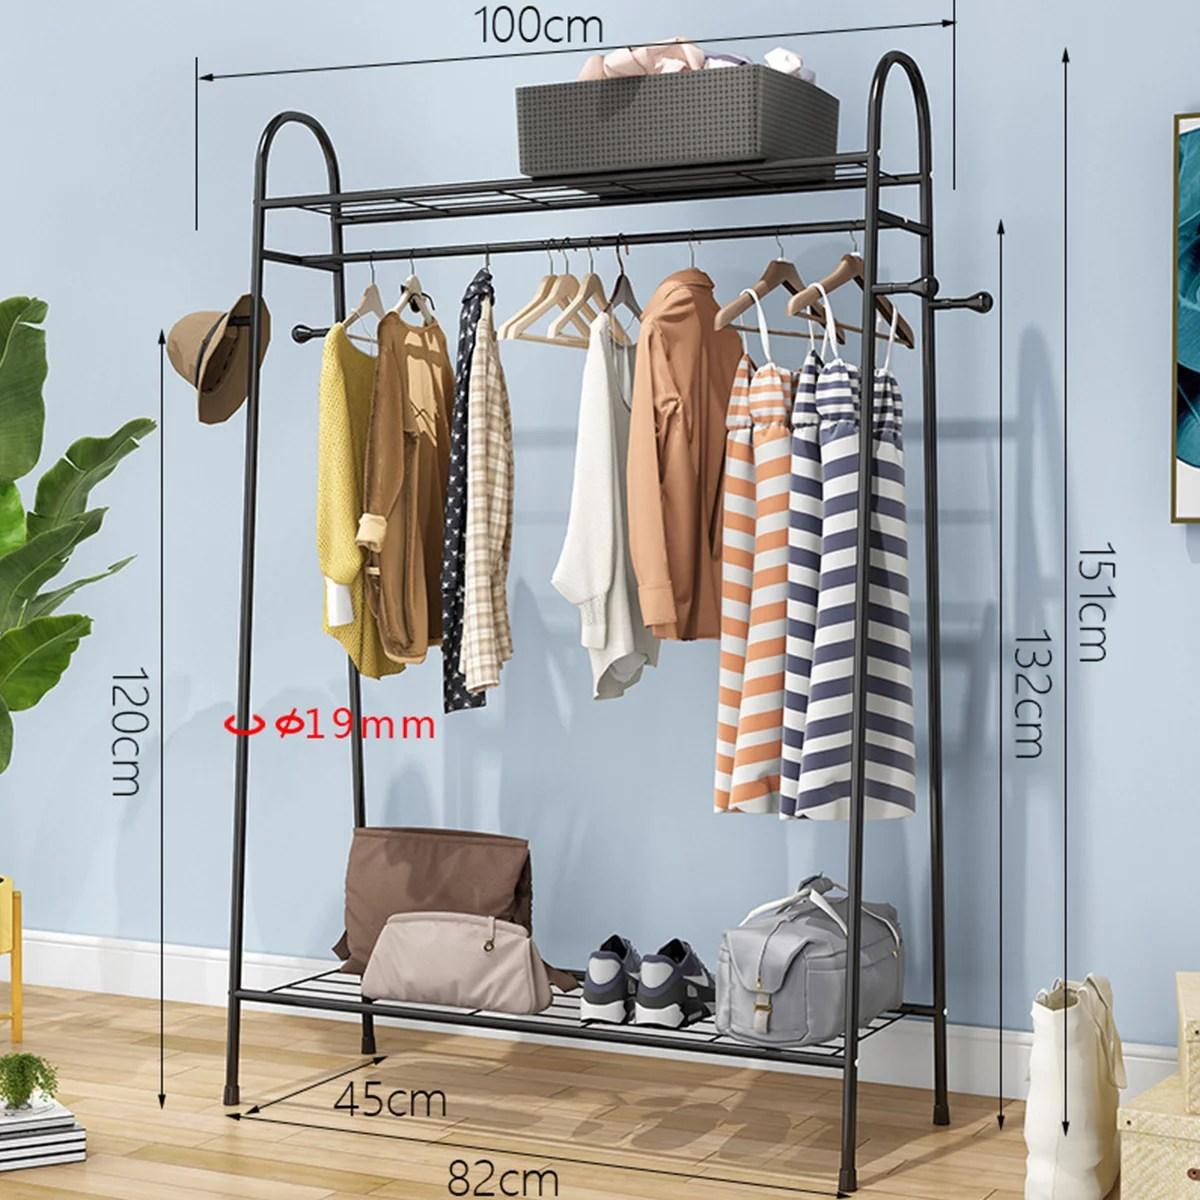 novashion clothes rack closet storage organizer garment hanger dry shelf heavy duty modern farmhouse slim garment rack white